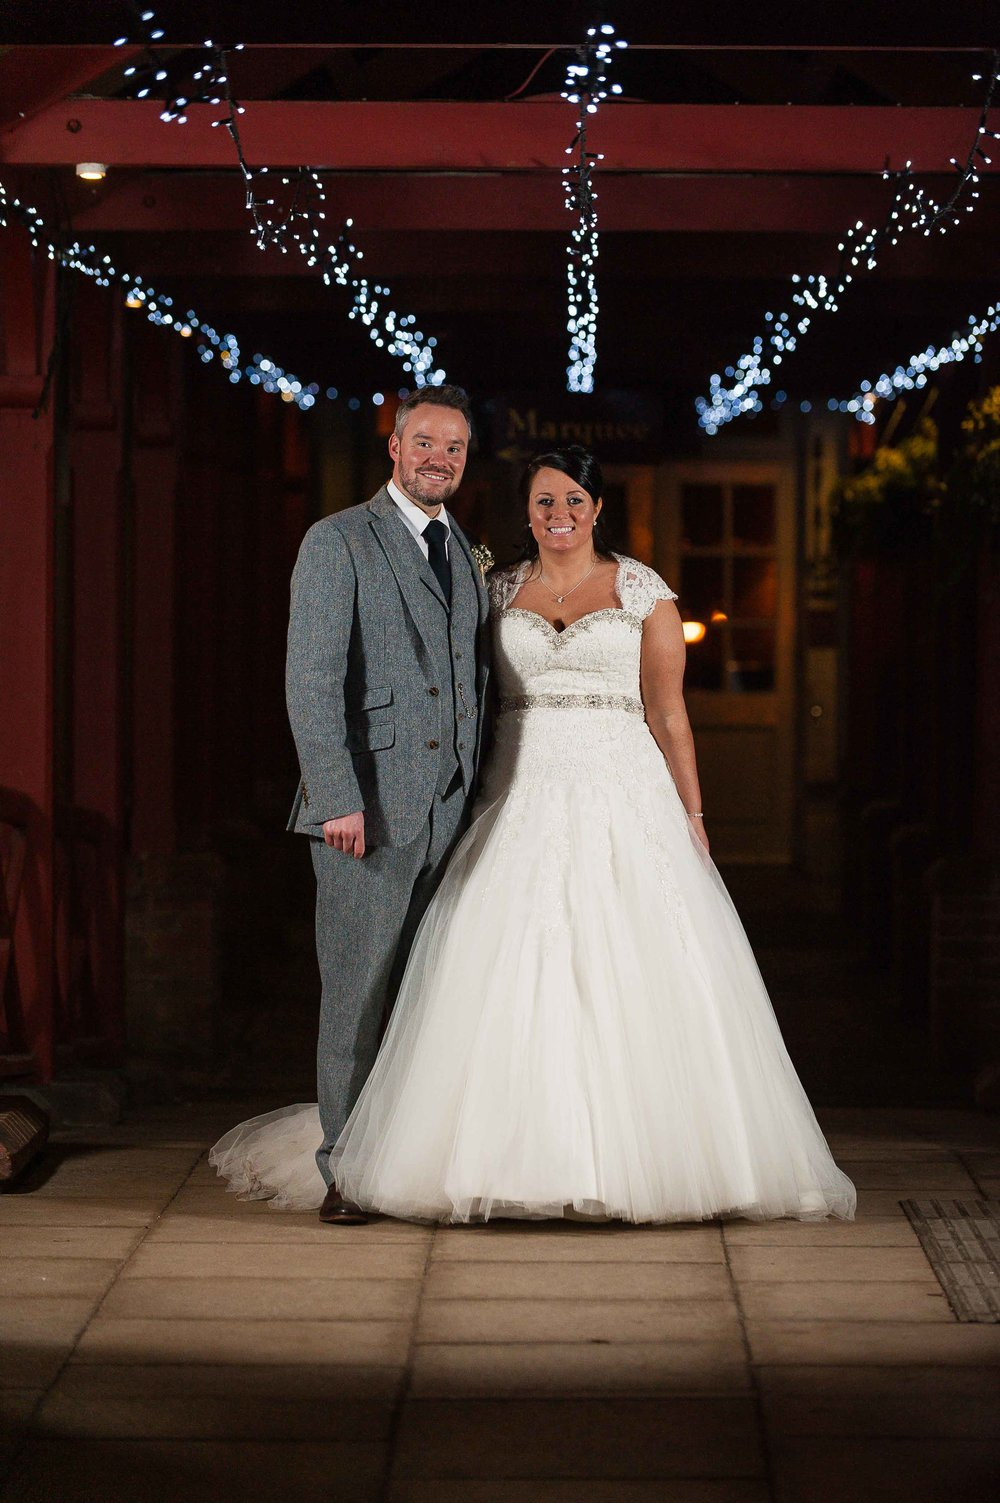 14.02.17 - Matt-Faye-Coombe-Abbey-Valentine-Wedding-Charnwood-Photography-1098.jpg